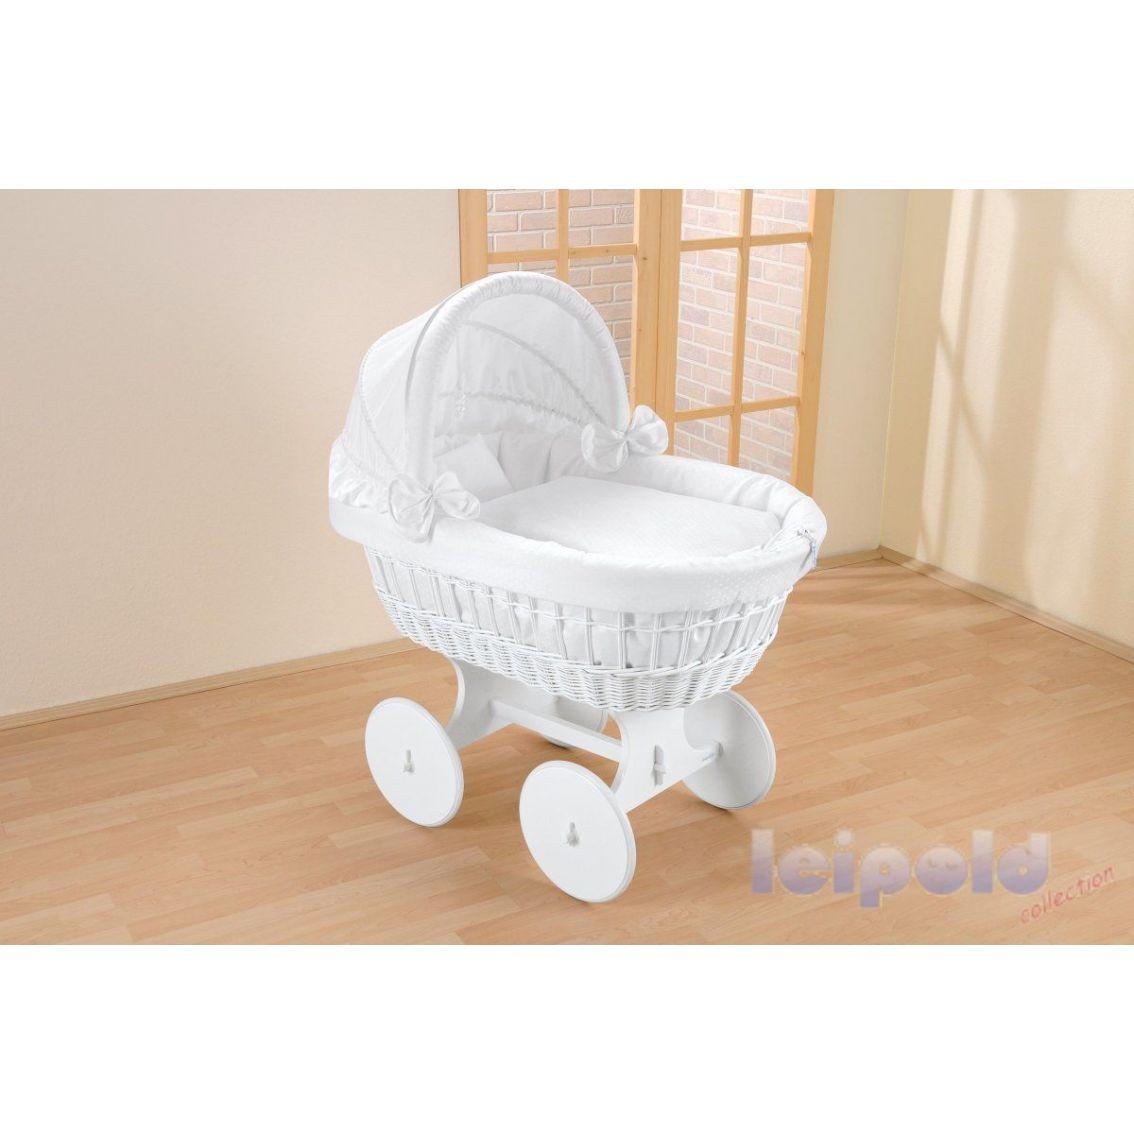 leipold topas bollerwagen crib leipold at w h watts pram. Black Bedroom Furniture Sets. Home Design Ideas